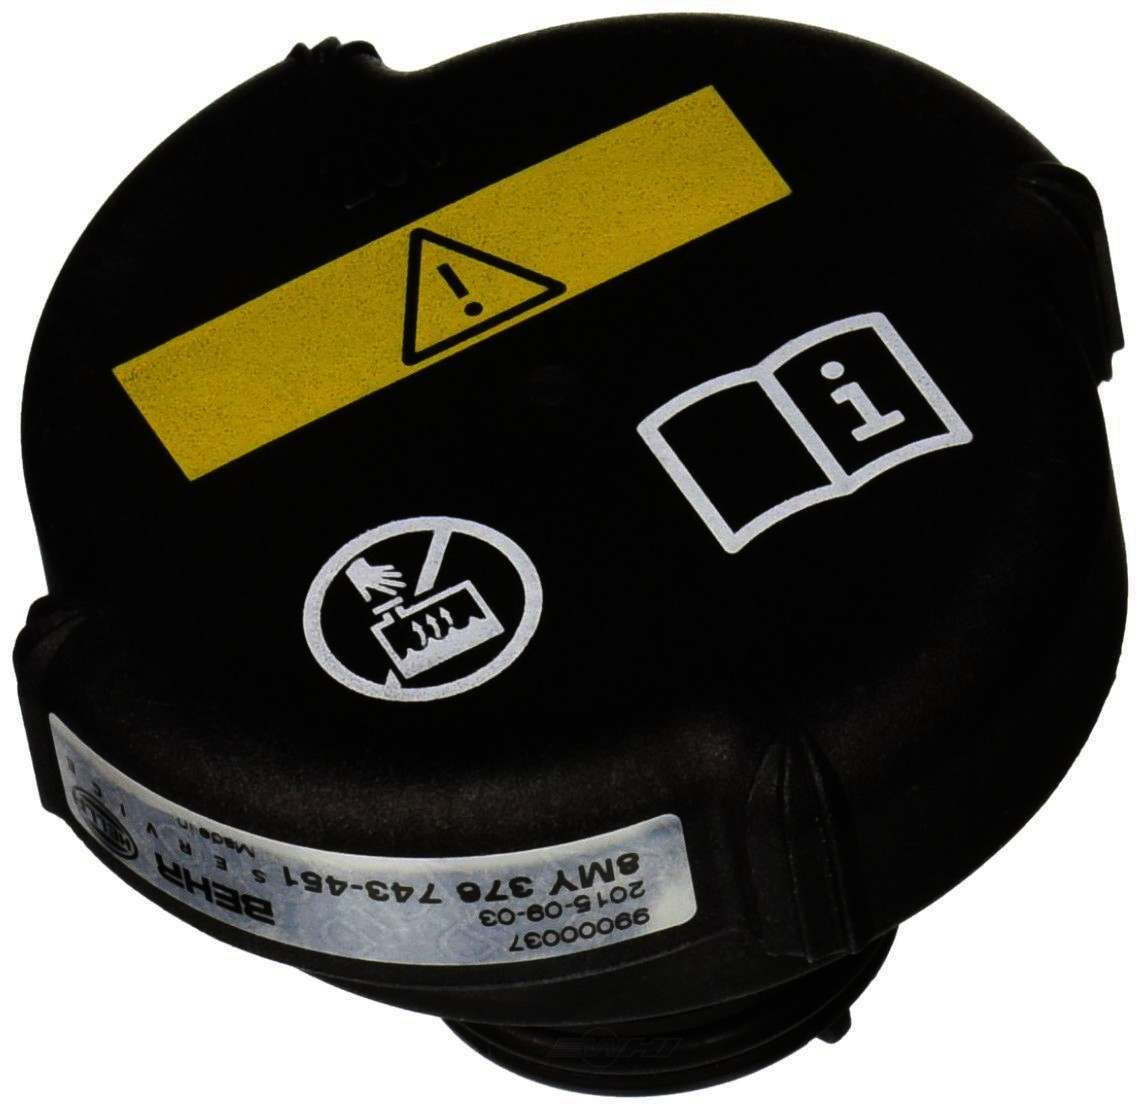 BEHR HELLA SERVICE - New Premium Perfect Fit Radiator Cap - BHS 376743451